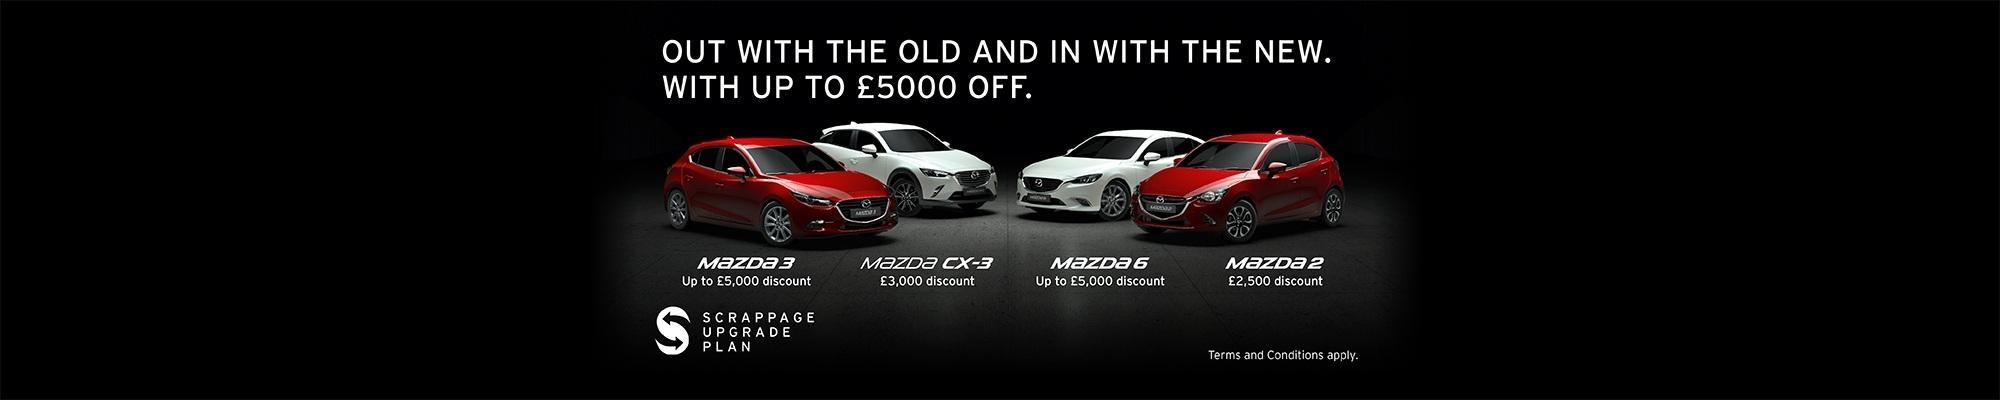 Mazda Scrappage Scheme